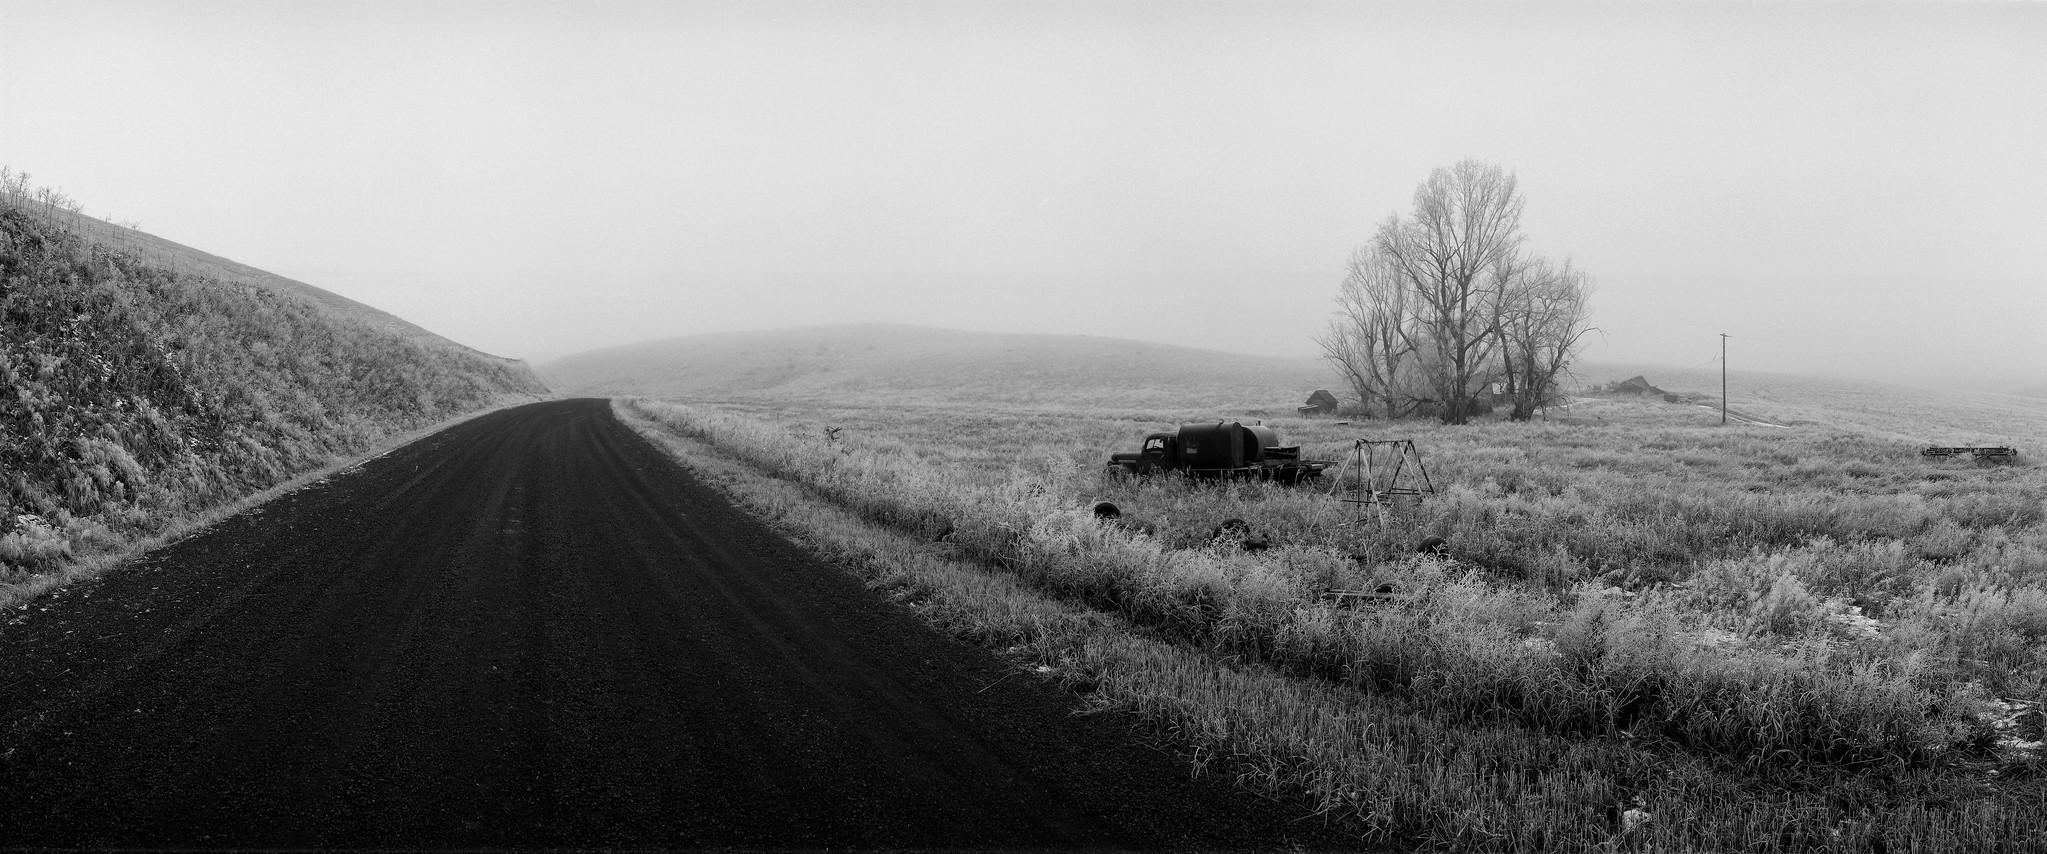 Eastern Washington | by austin granger